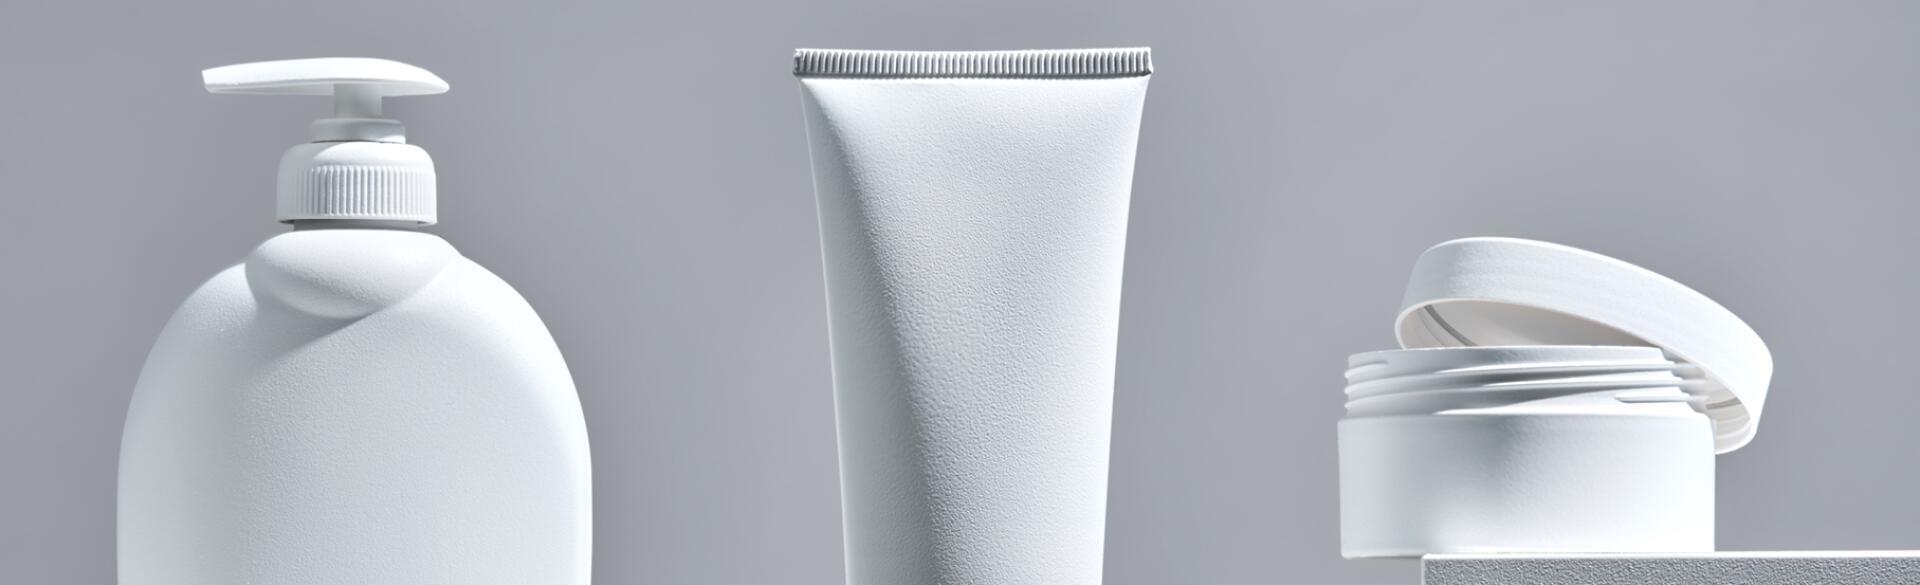 At Home Beauty Creams and treatments